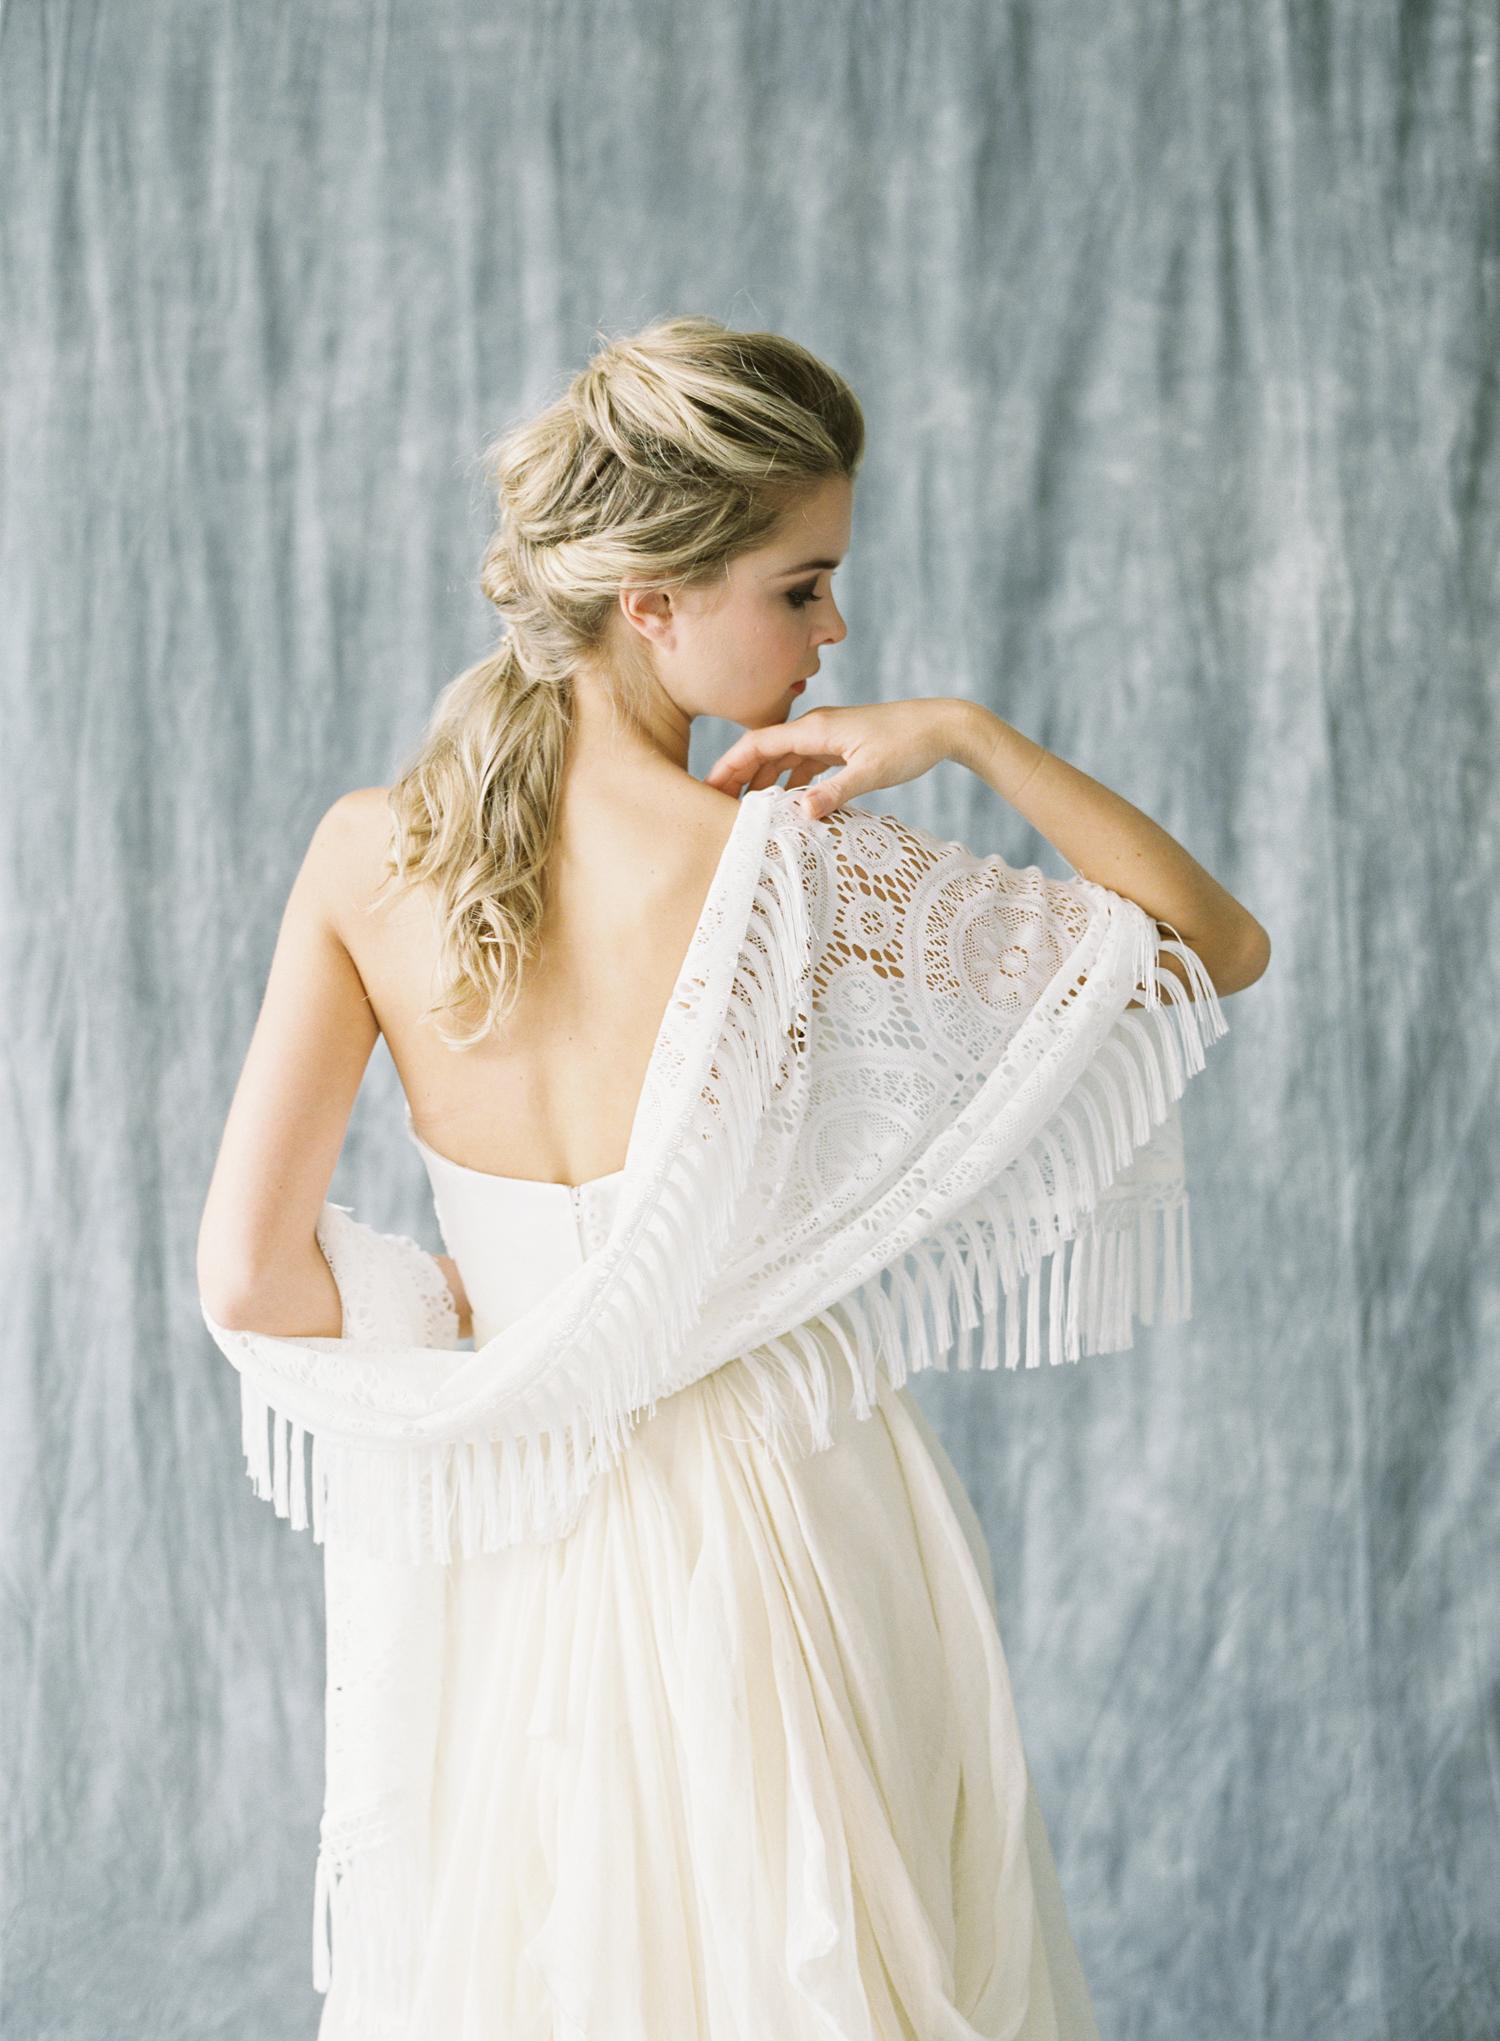 Carol Hannah Celestial Bustier and Kensington Skirt Ivory.jpg